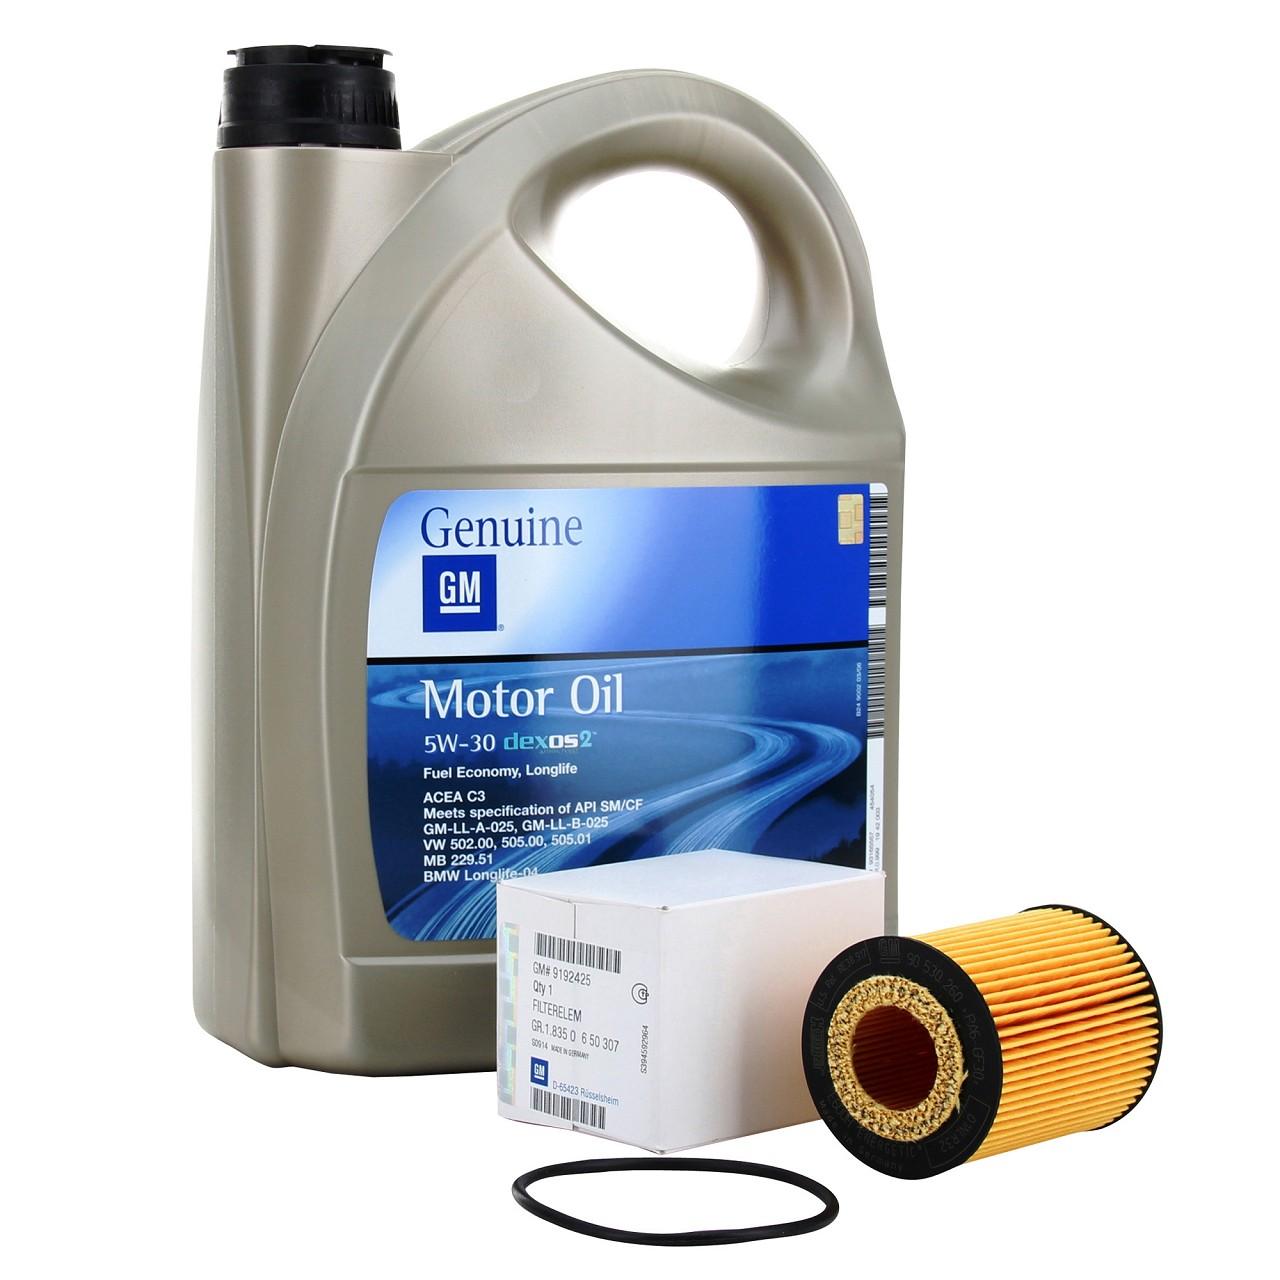 ORIGINAL GM Opel Motoröl 5W30 5W-30 Dexos2 LongLife 5 Liter + Ölfilter 9192425